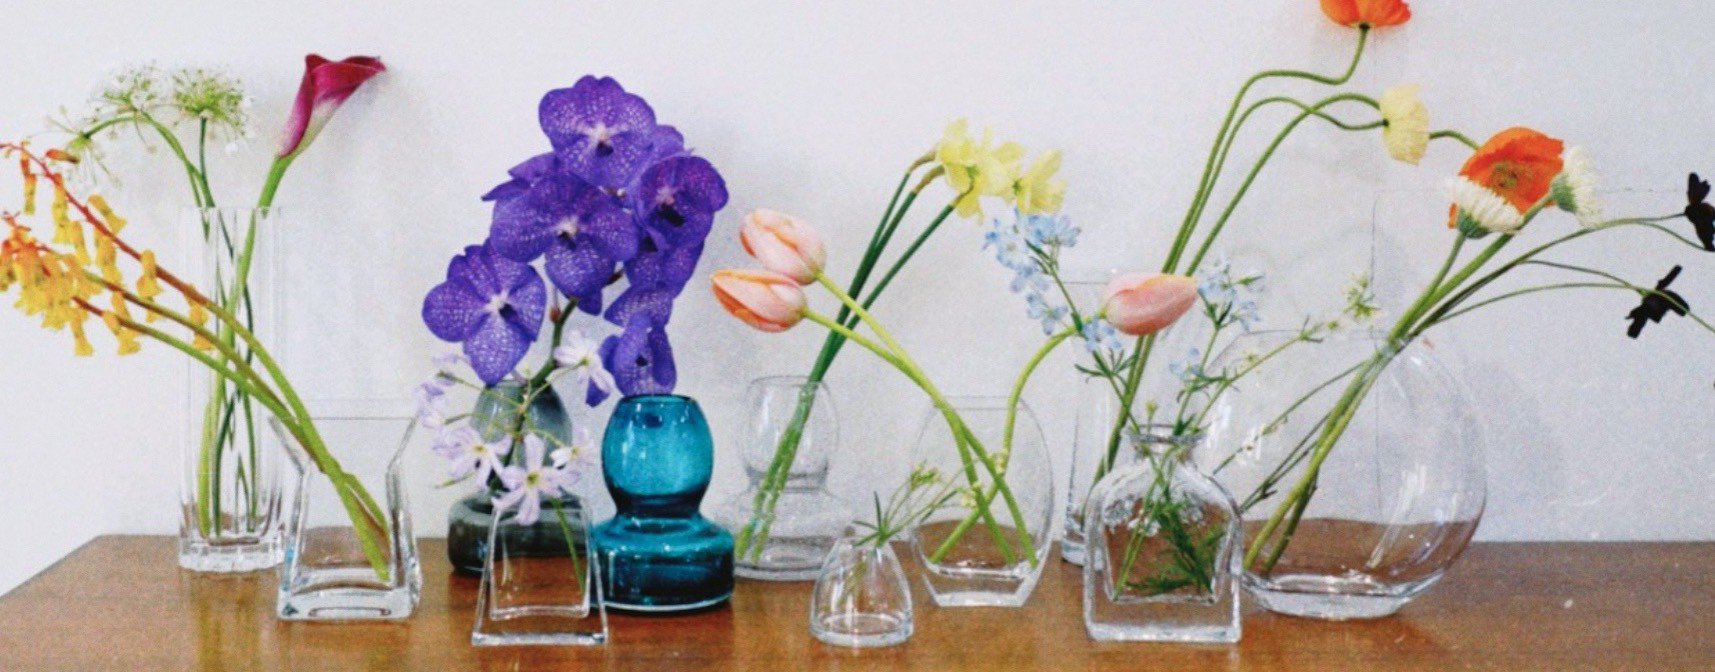 flowerbase visual